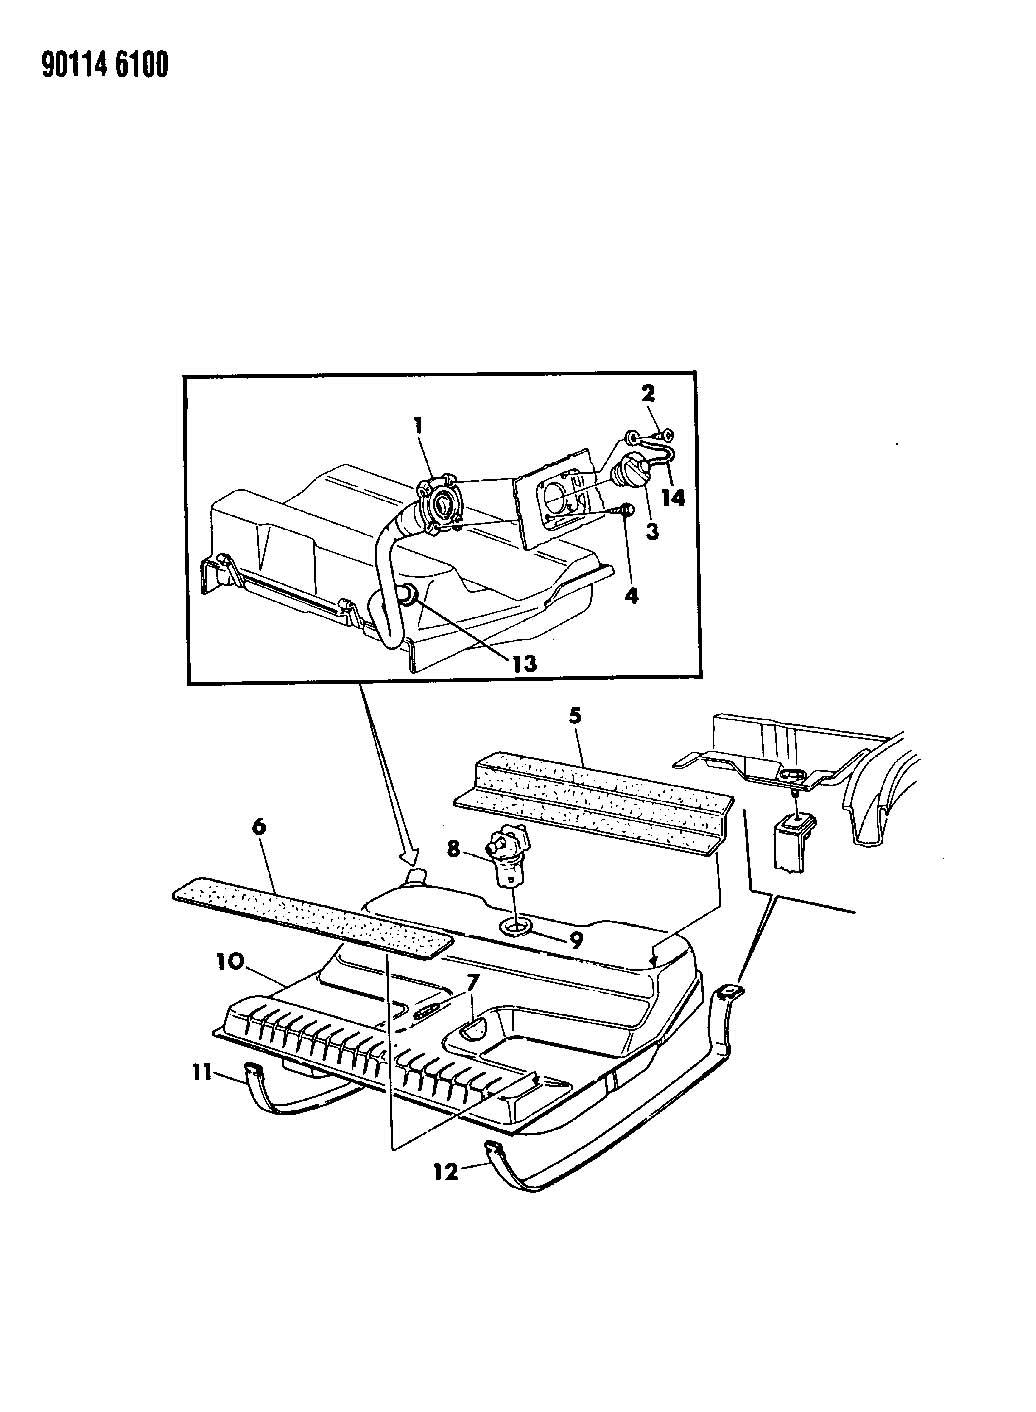 1992 Dodge Dakota Valve. Fuel tank rollover safety